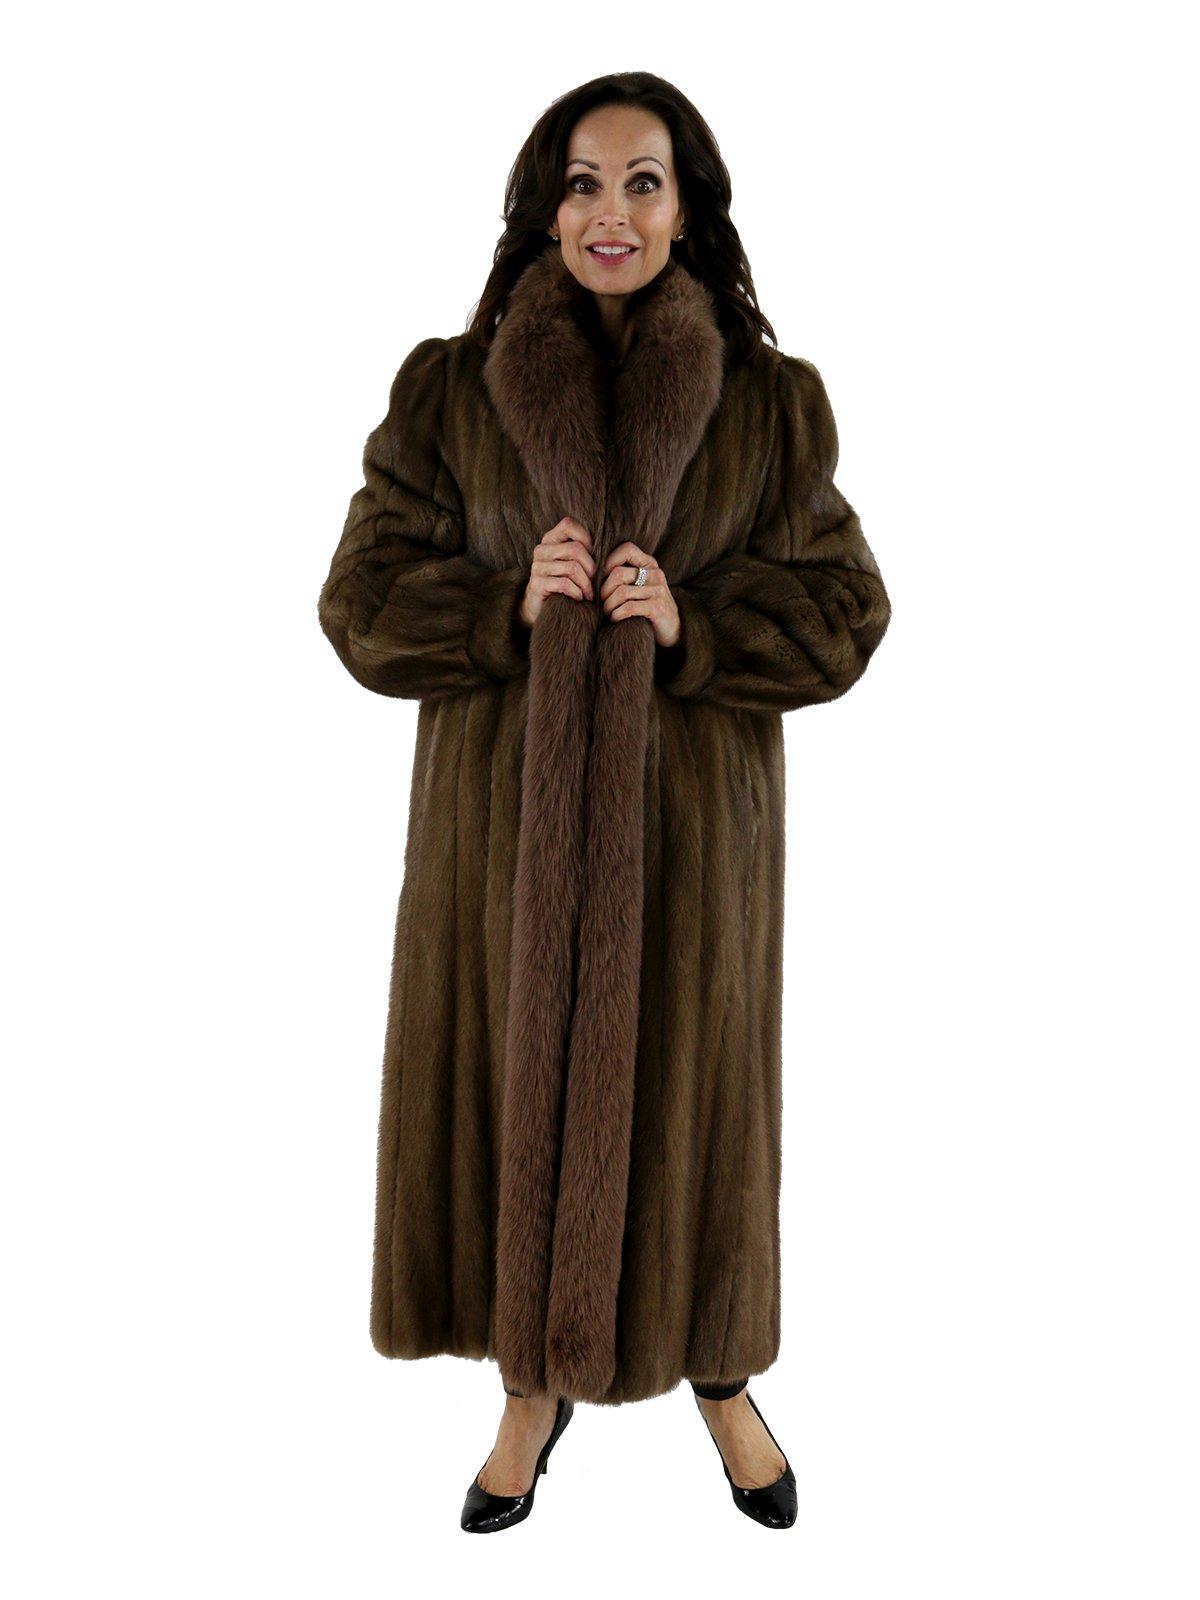 Coyote Fur Coat Womens Large Estate Furs >> Pastel Mink Fur Coat W Matching Fox Tuxedo Front Women S Large Estate Furs